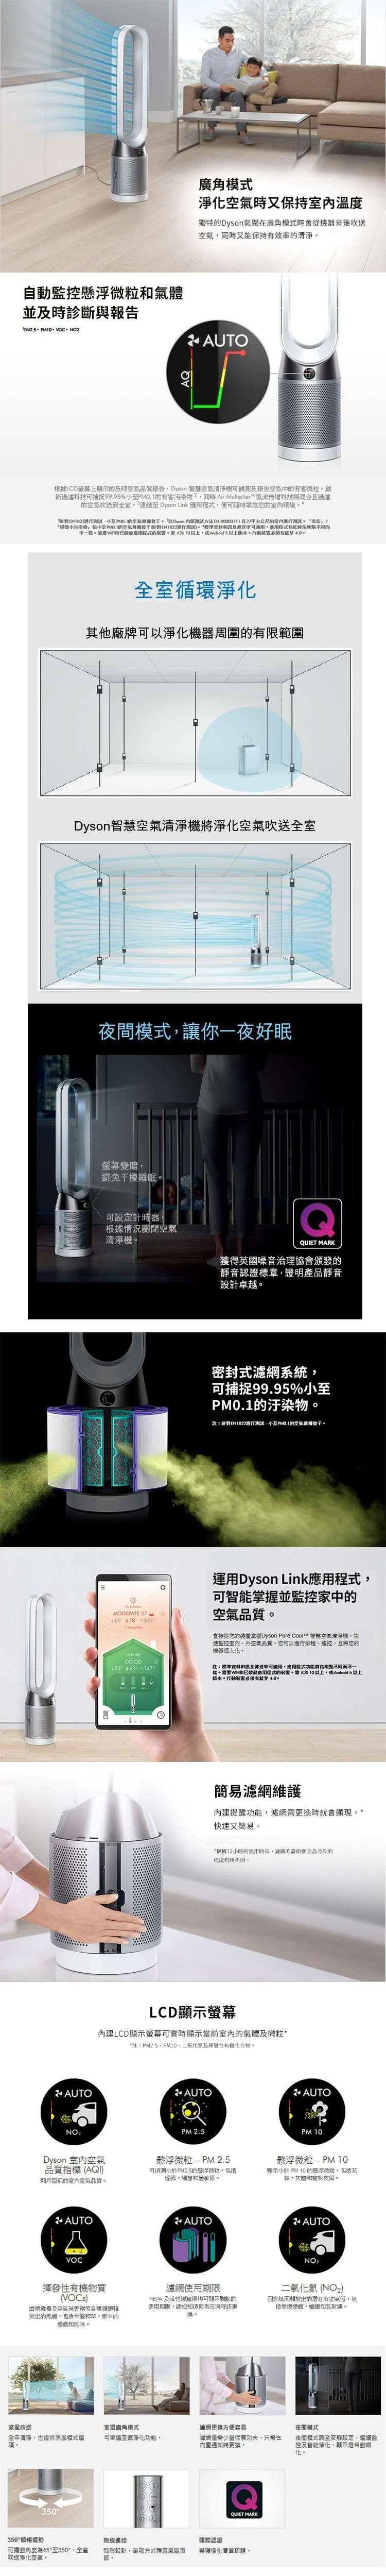 72H出貨 Dyson Pure Cool TP 涼風空氣清淨機 空氣清淨機 智慧 無扇葉 風扇